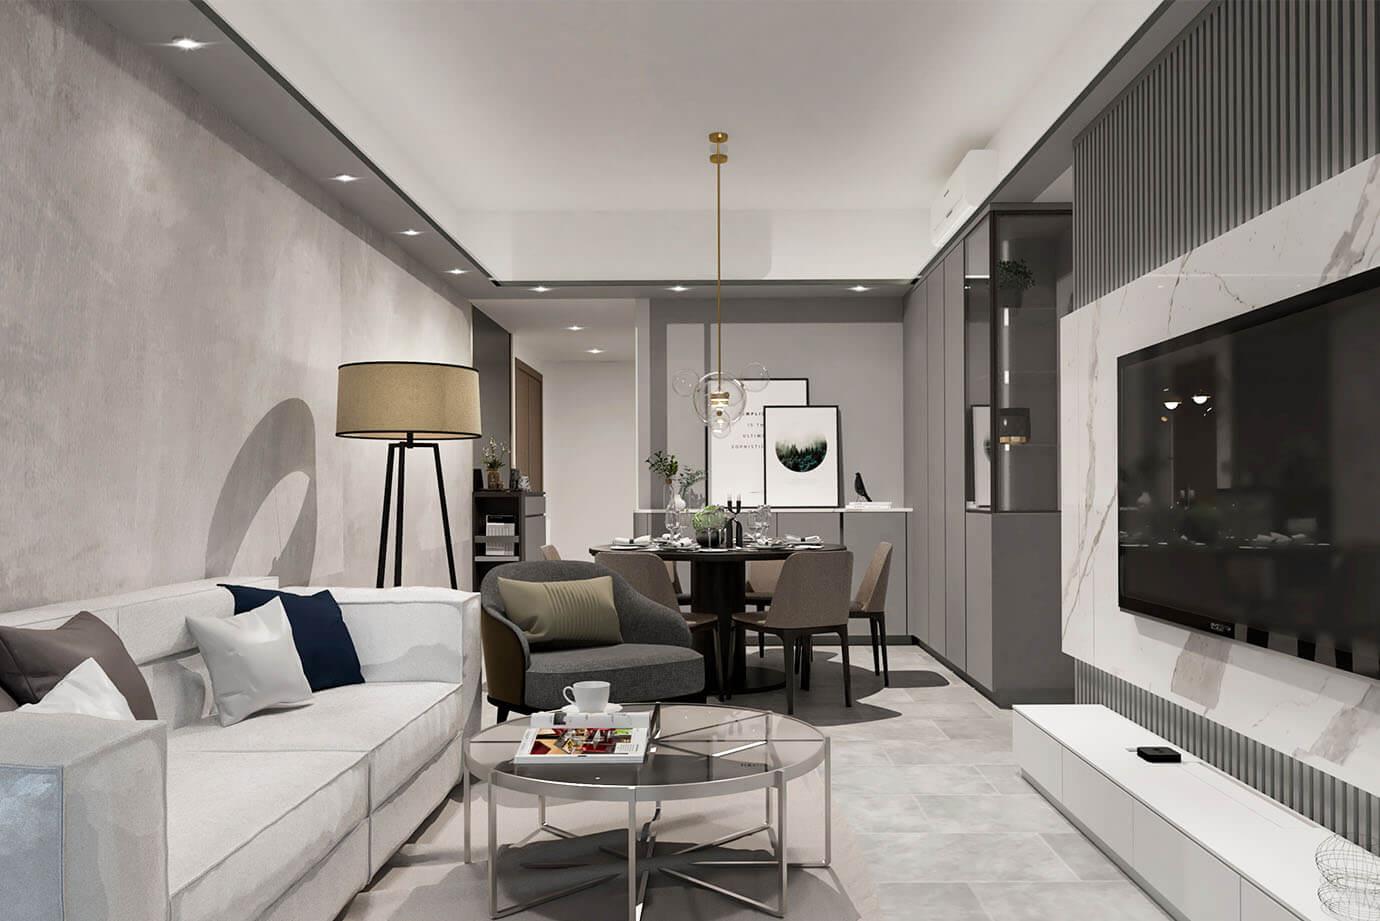 Inch Interior Design Hong Kong St. Martin 大埔雲匯